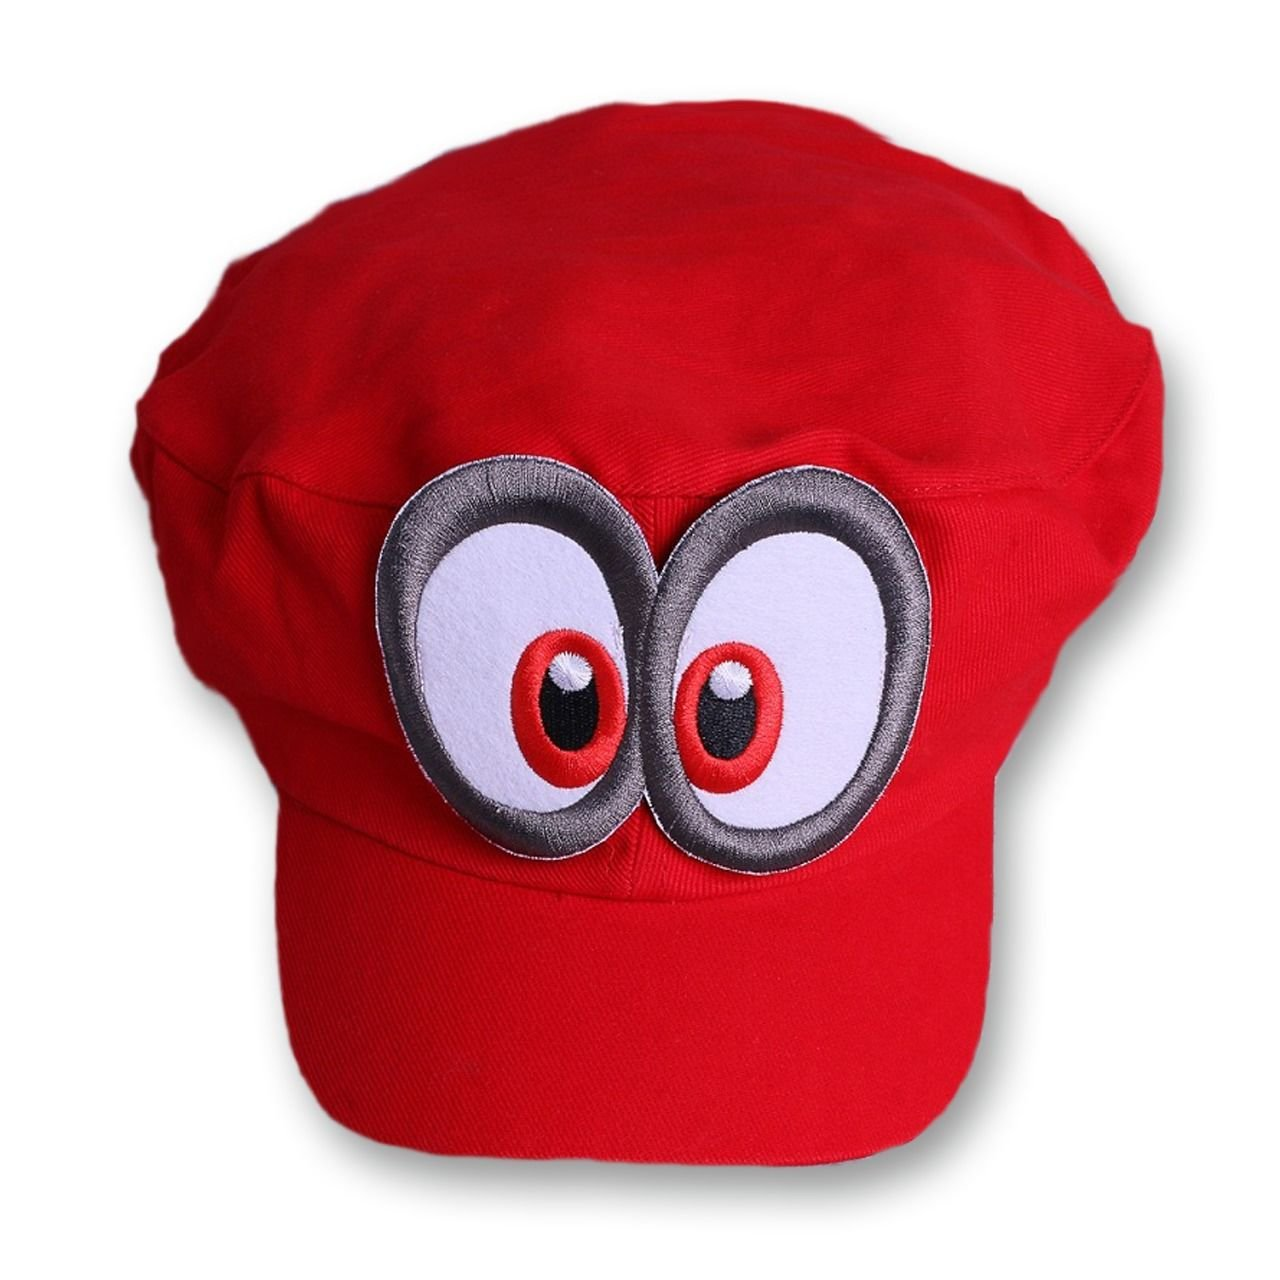 Super Mario Odyssey Cappy Hat Uk Super Mario Odyssey